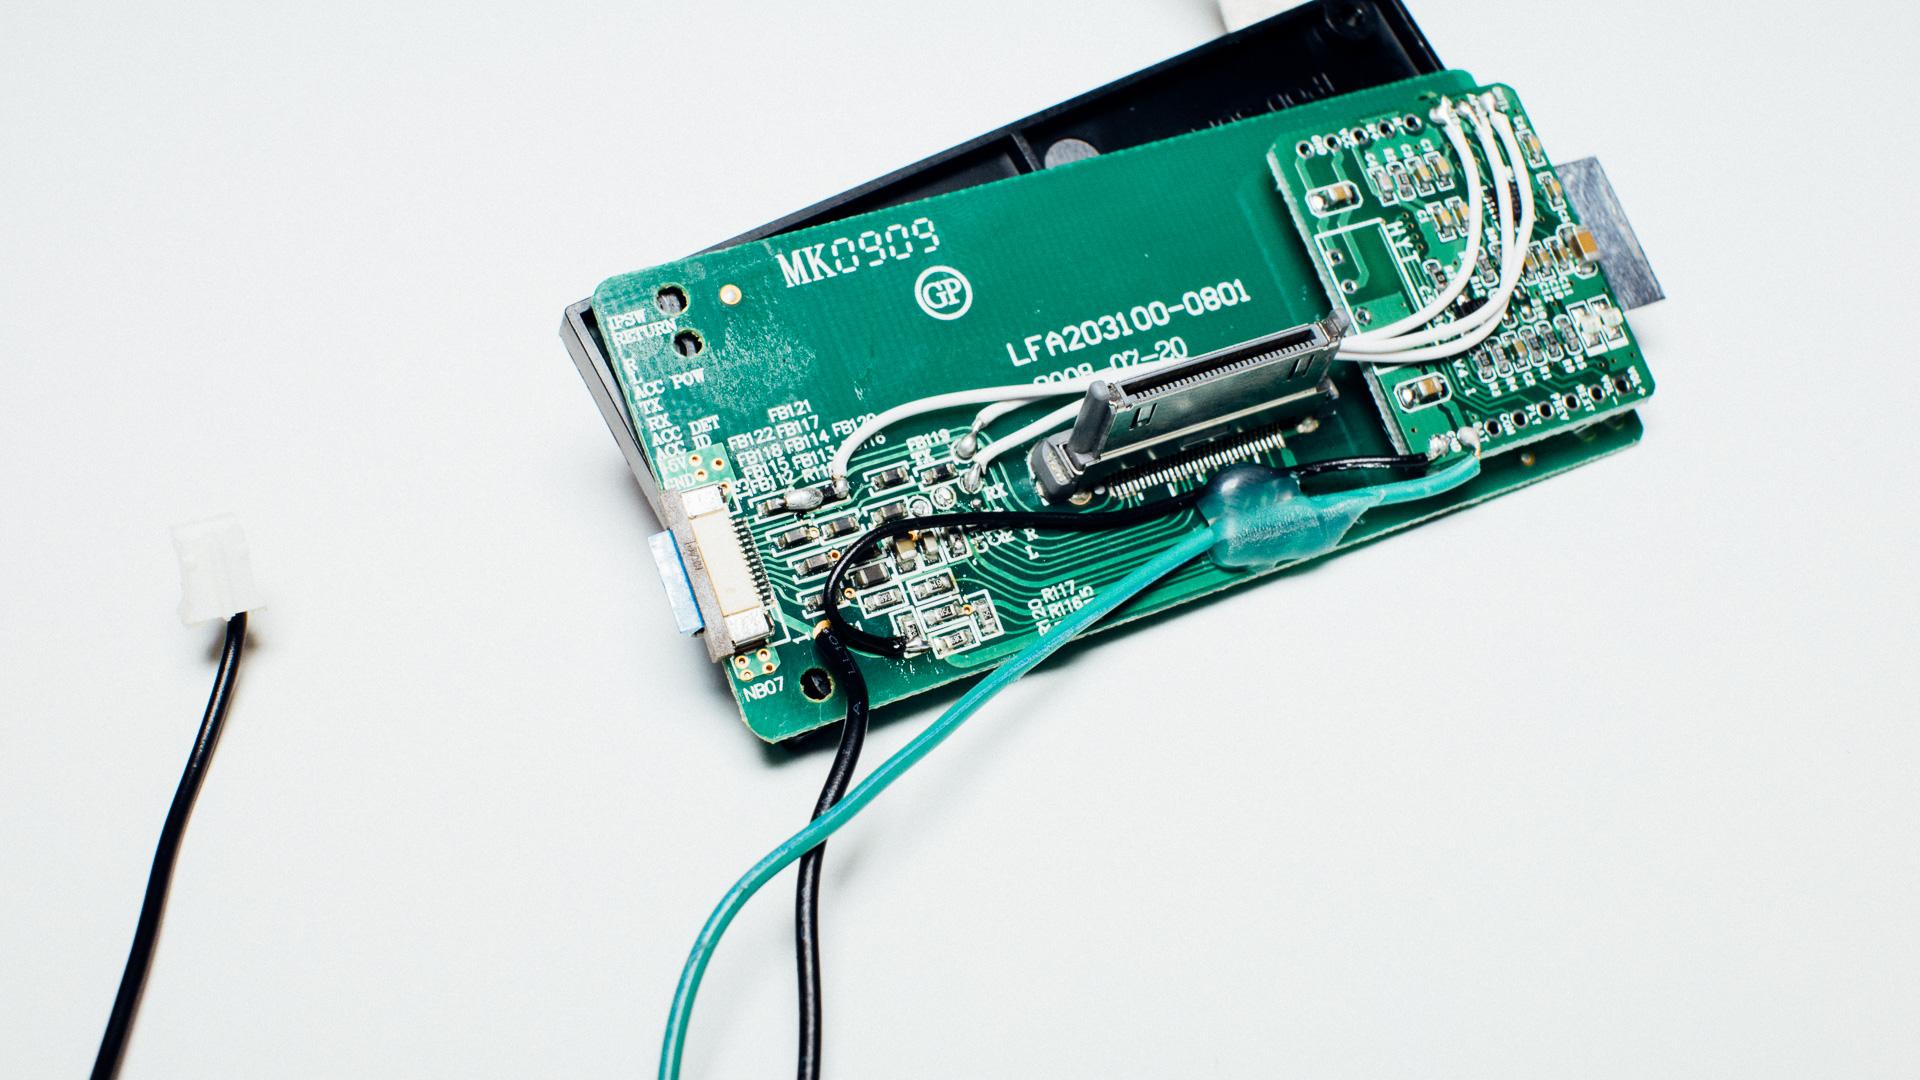 Modifying A Portable Ipod Docking To Bluetooth